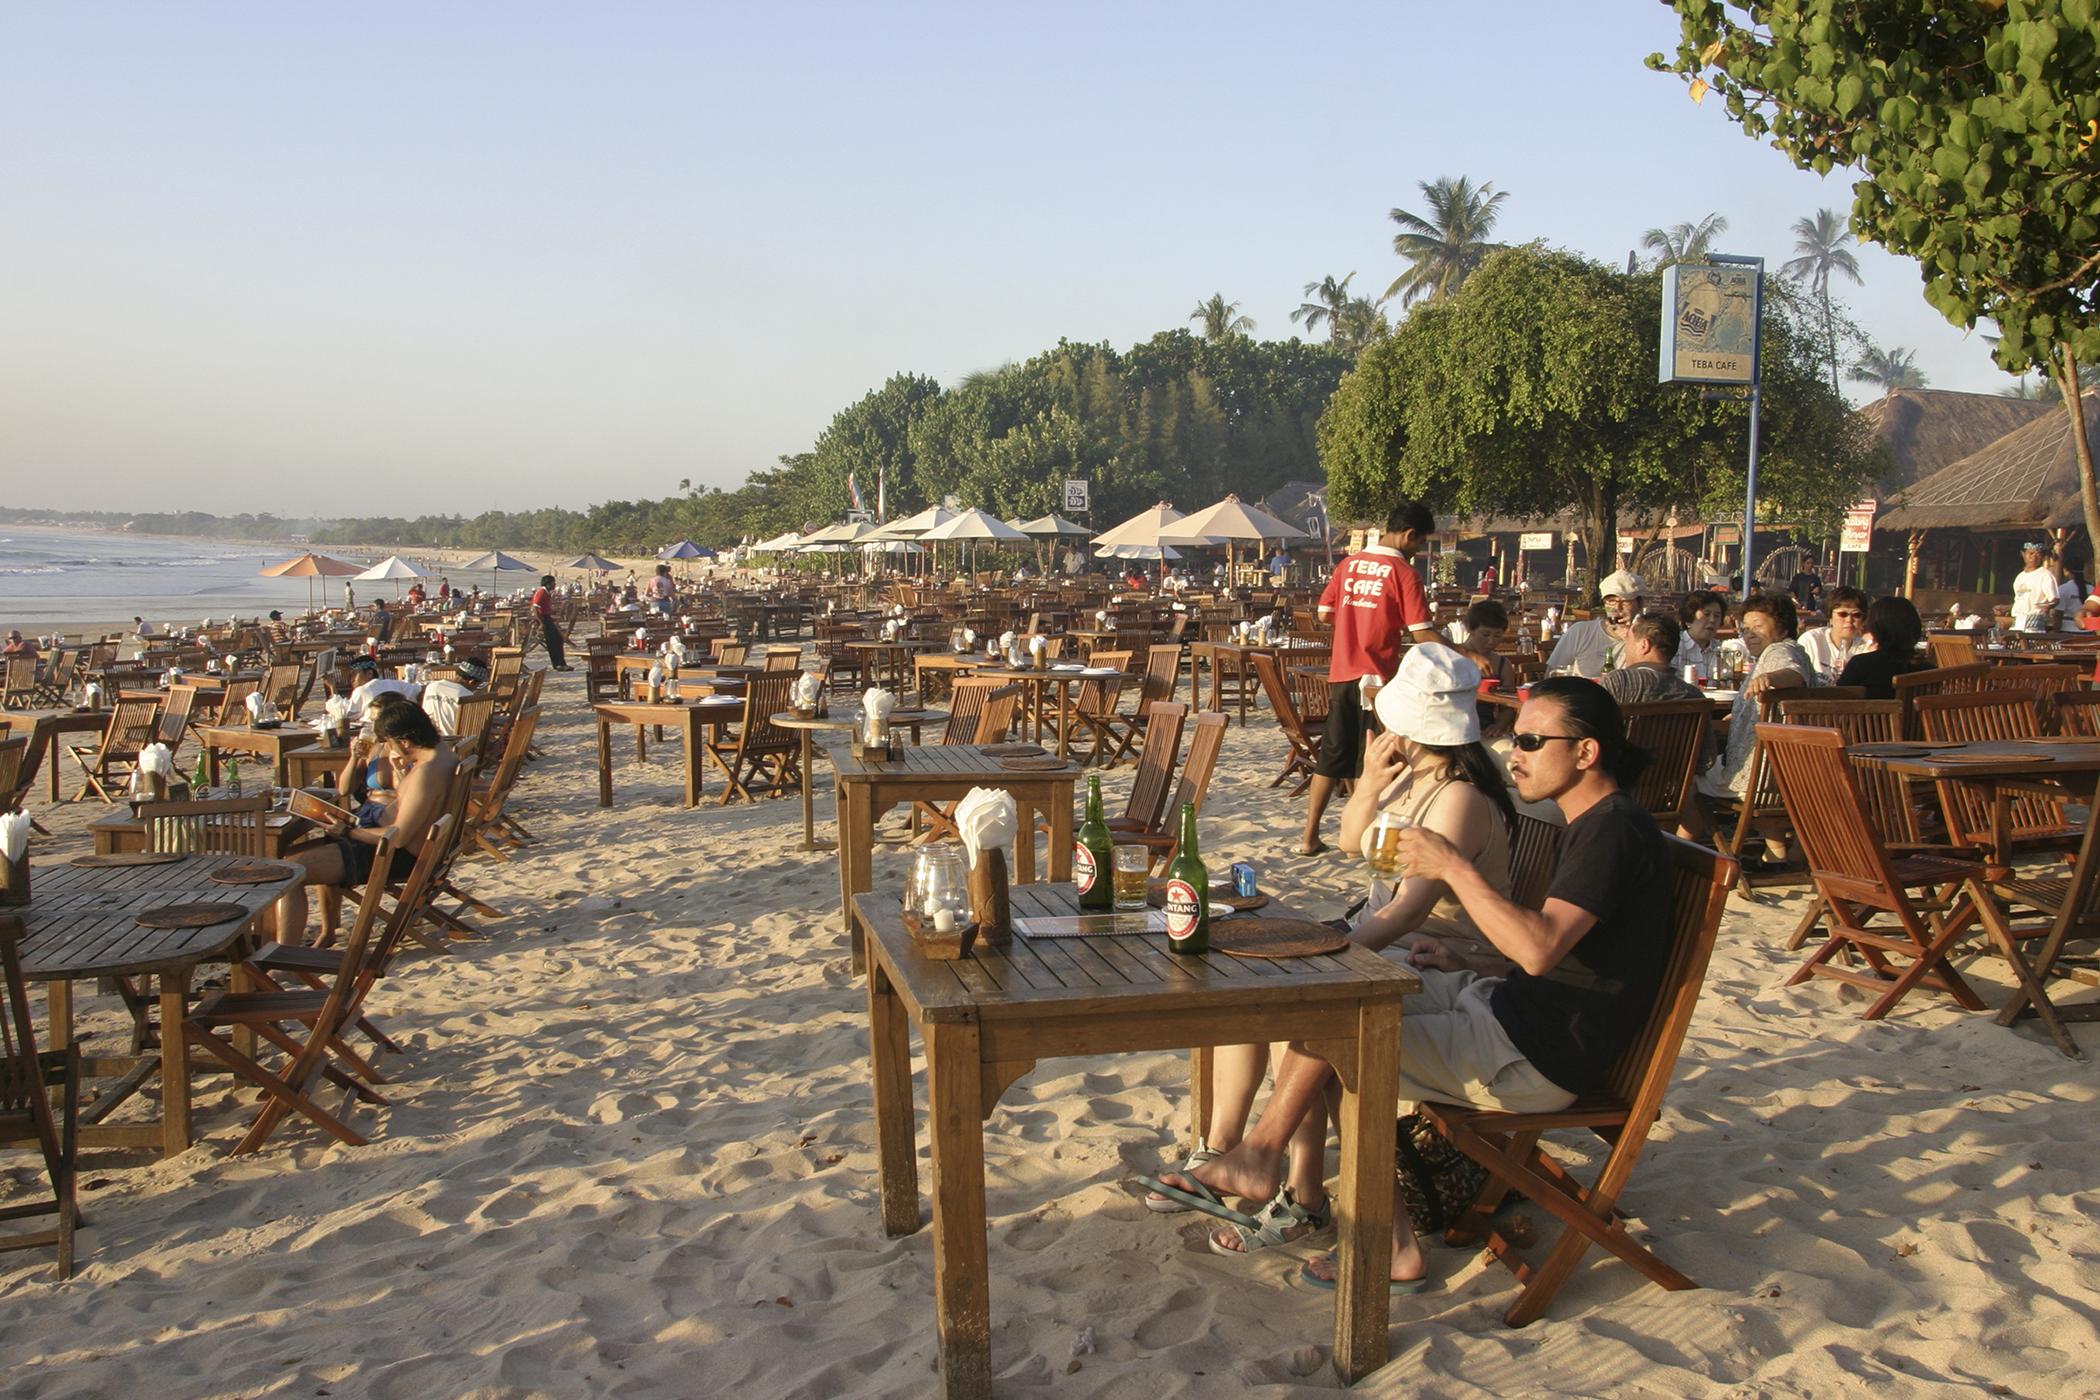 170316-travel-best-beaches-jimbaran-bali